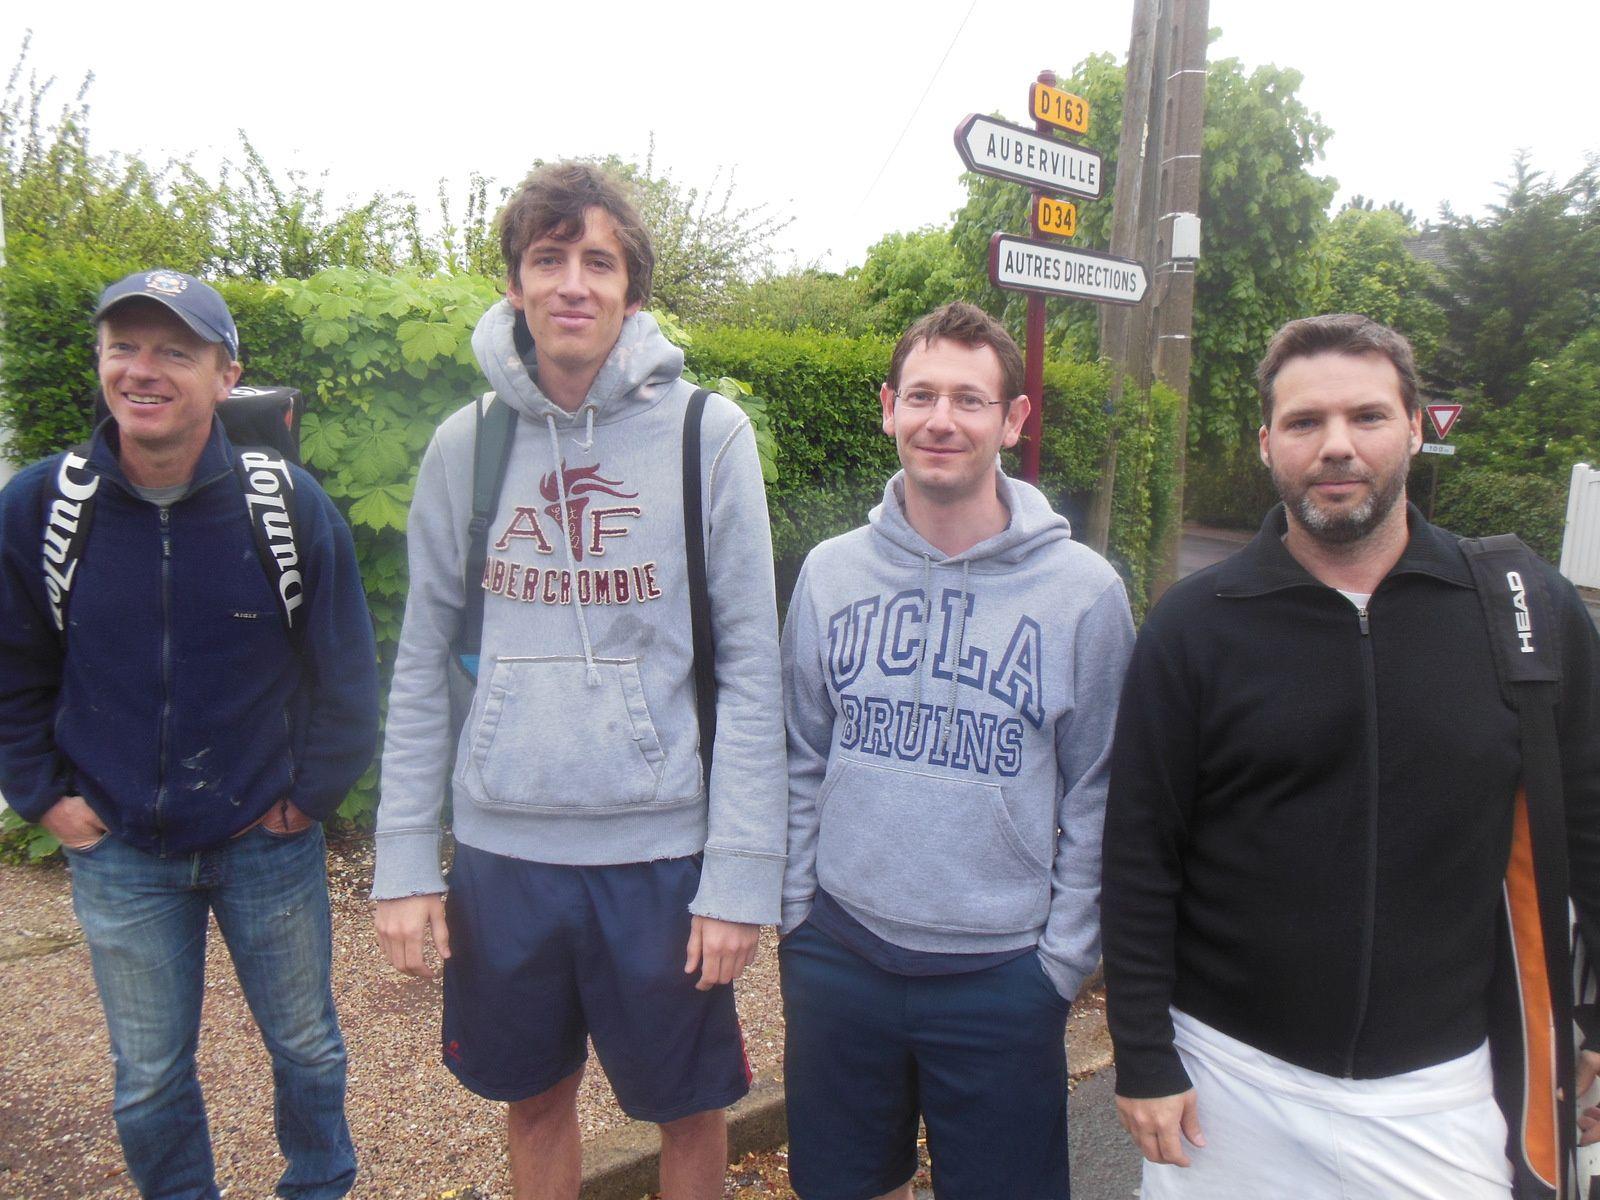 Nicolas L, Basile B, Christophe M et Stanislas M